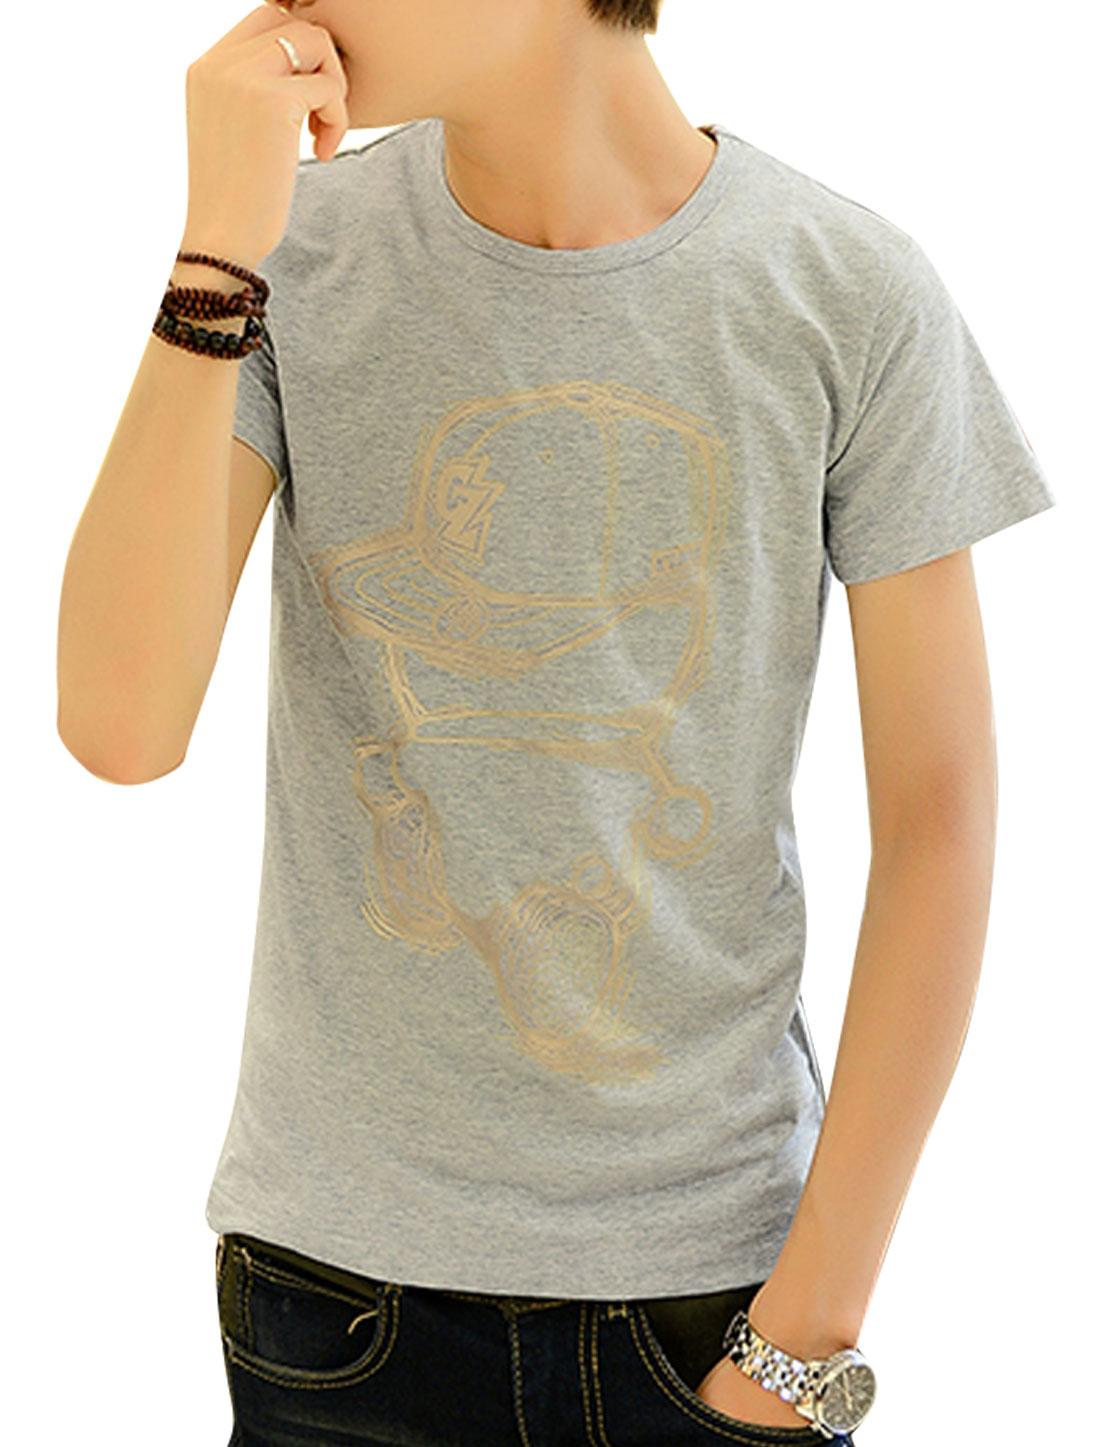 Soft Short Sleeve Cartoon Prints T-Shirt for Men Light Gray S